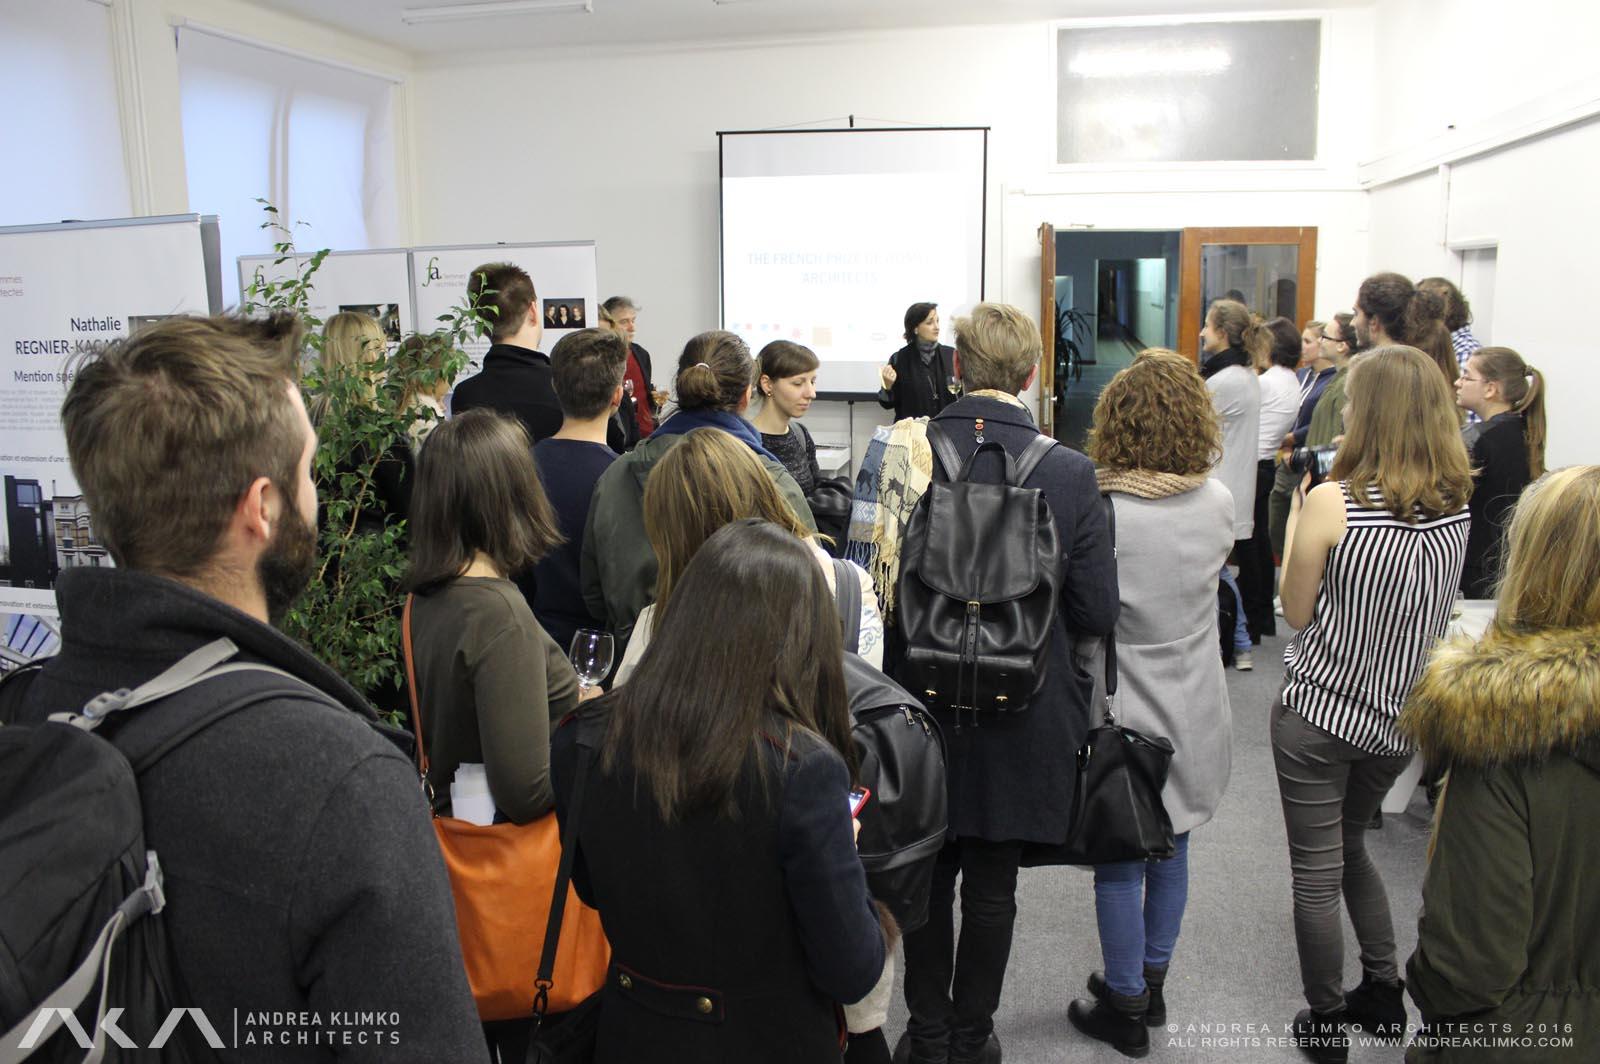 prix-des-femmes-architectes-on-display-in-bratislava_06